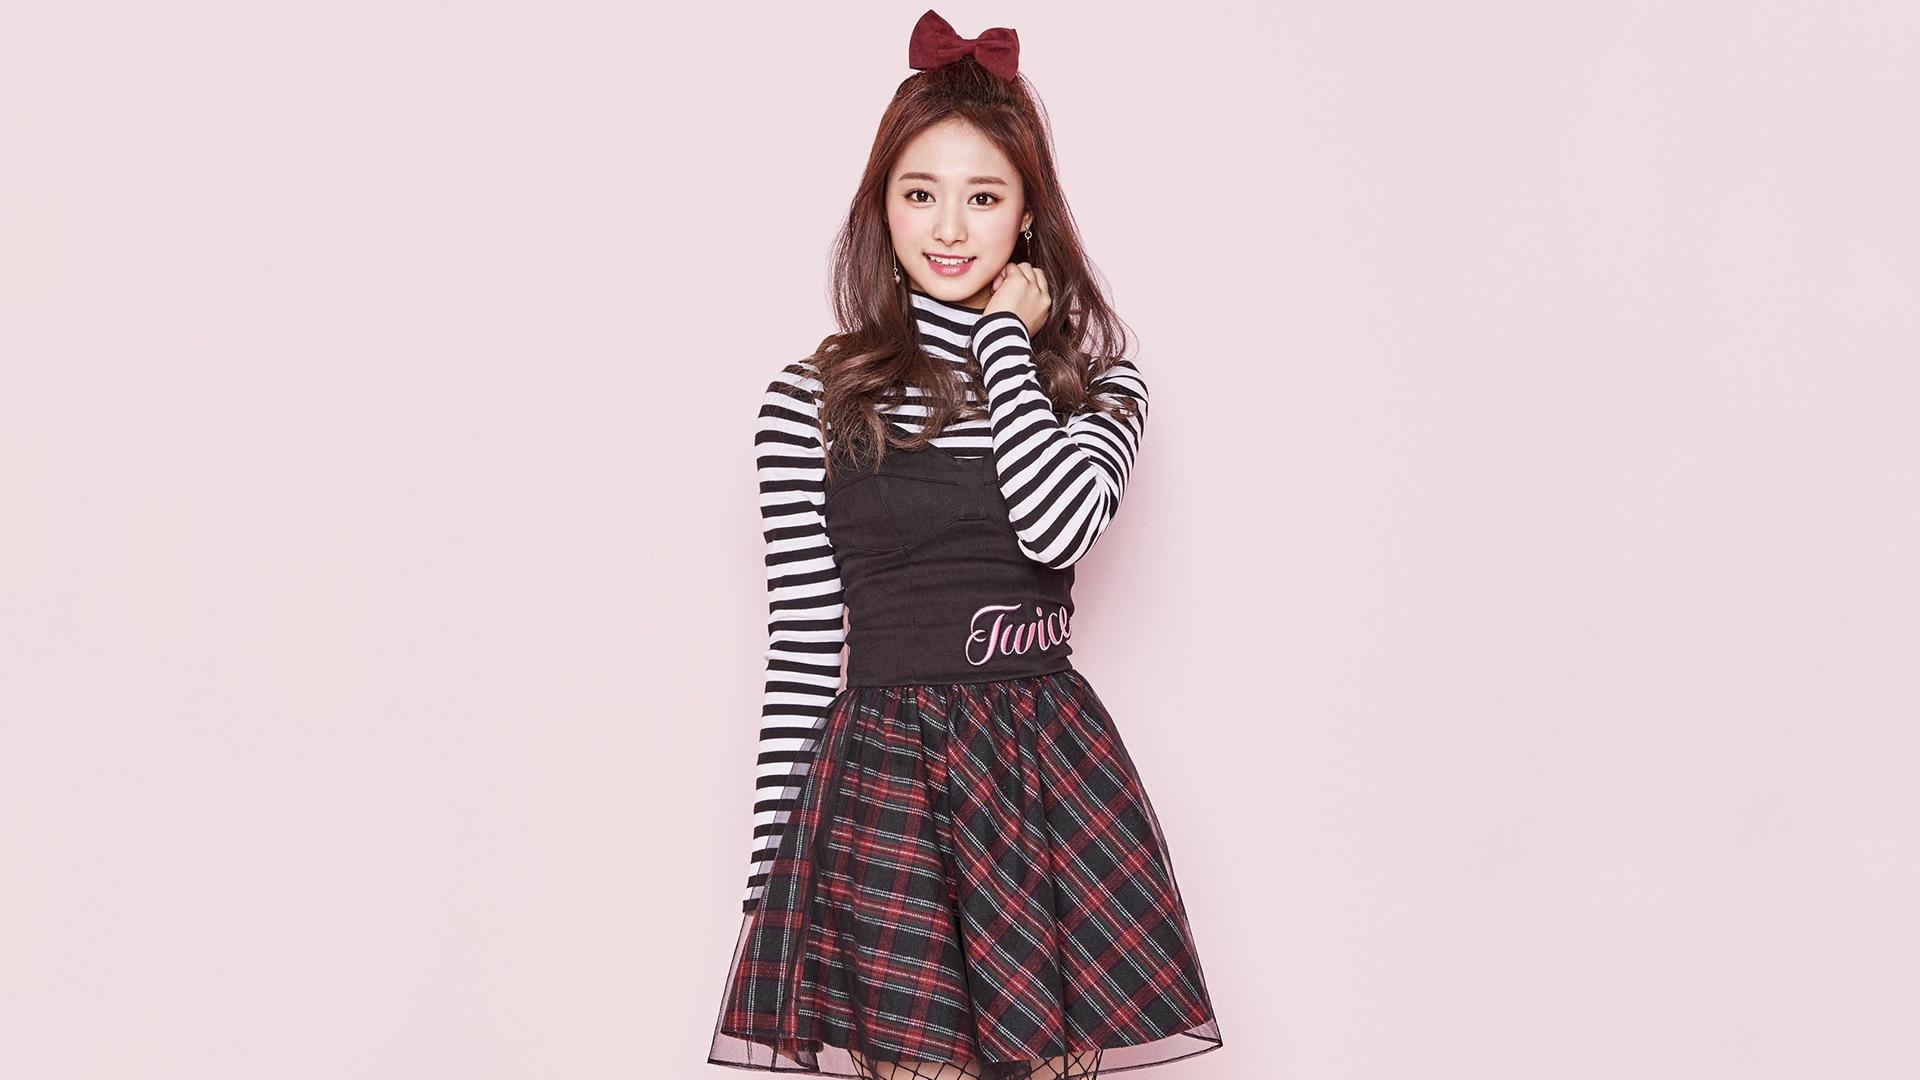 Twice Tzuyu Cutie Hd Wallpaper Background Image 1920x1080 Id